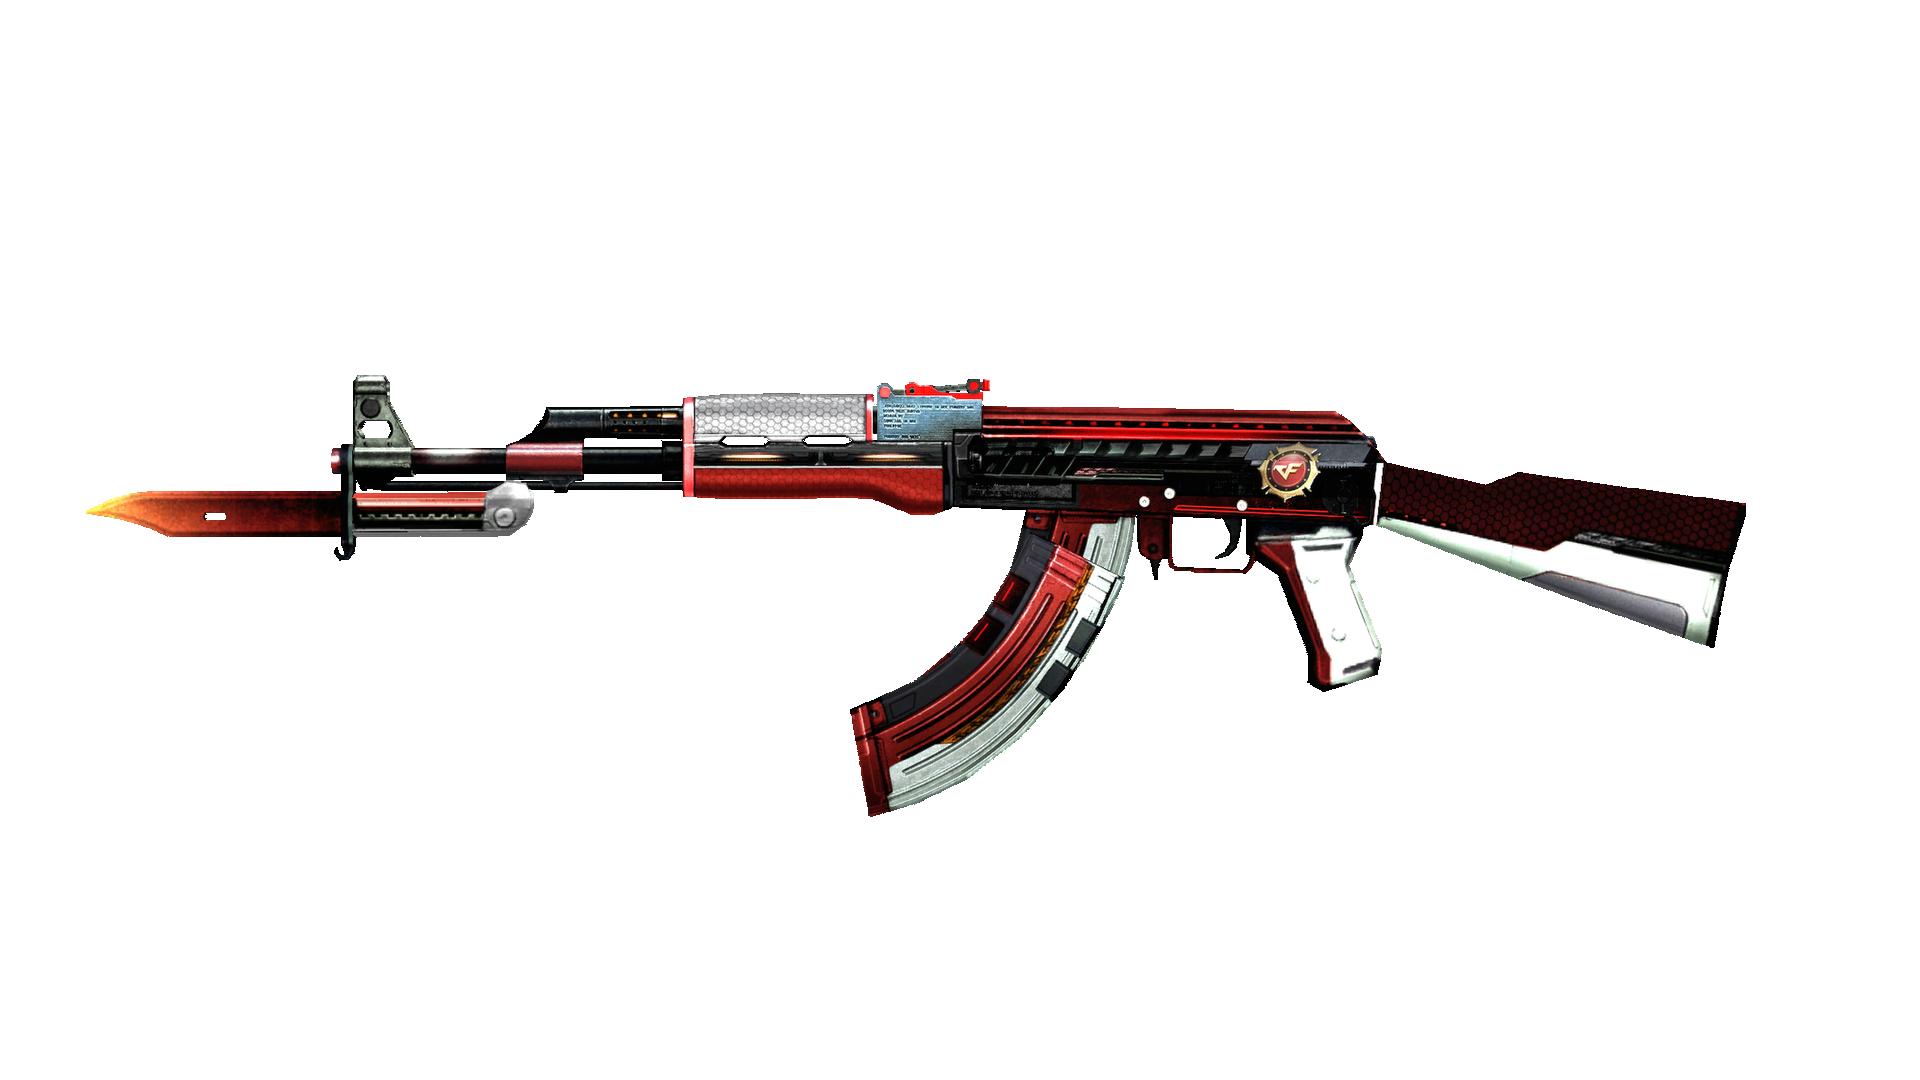 AK47-Knife Dual Mag Rank Match Red   Crossfire Wiki   FANDOM powered by  Wikia